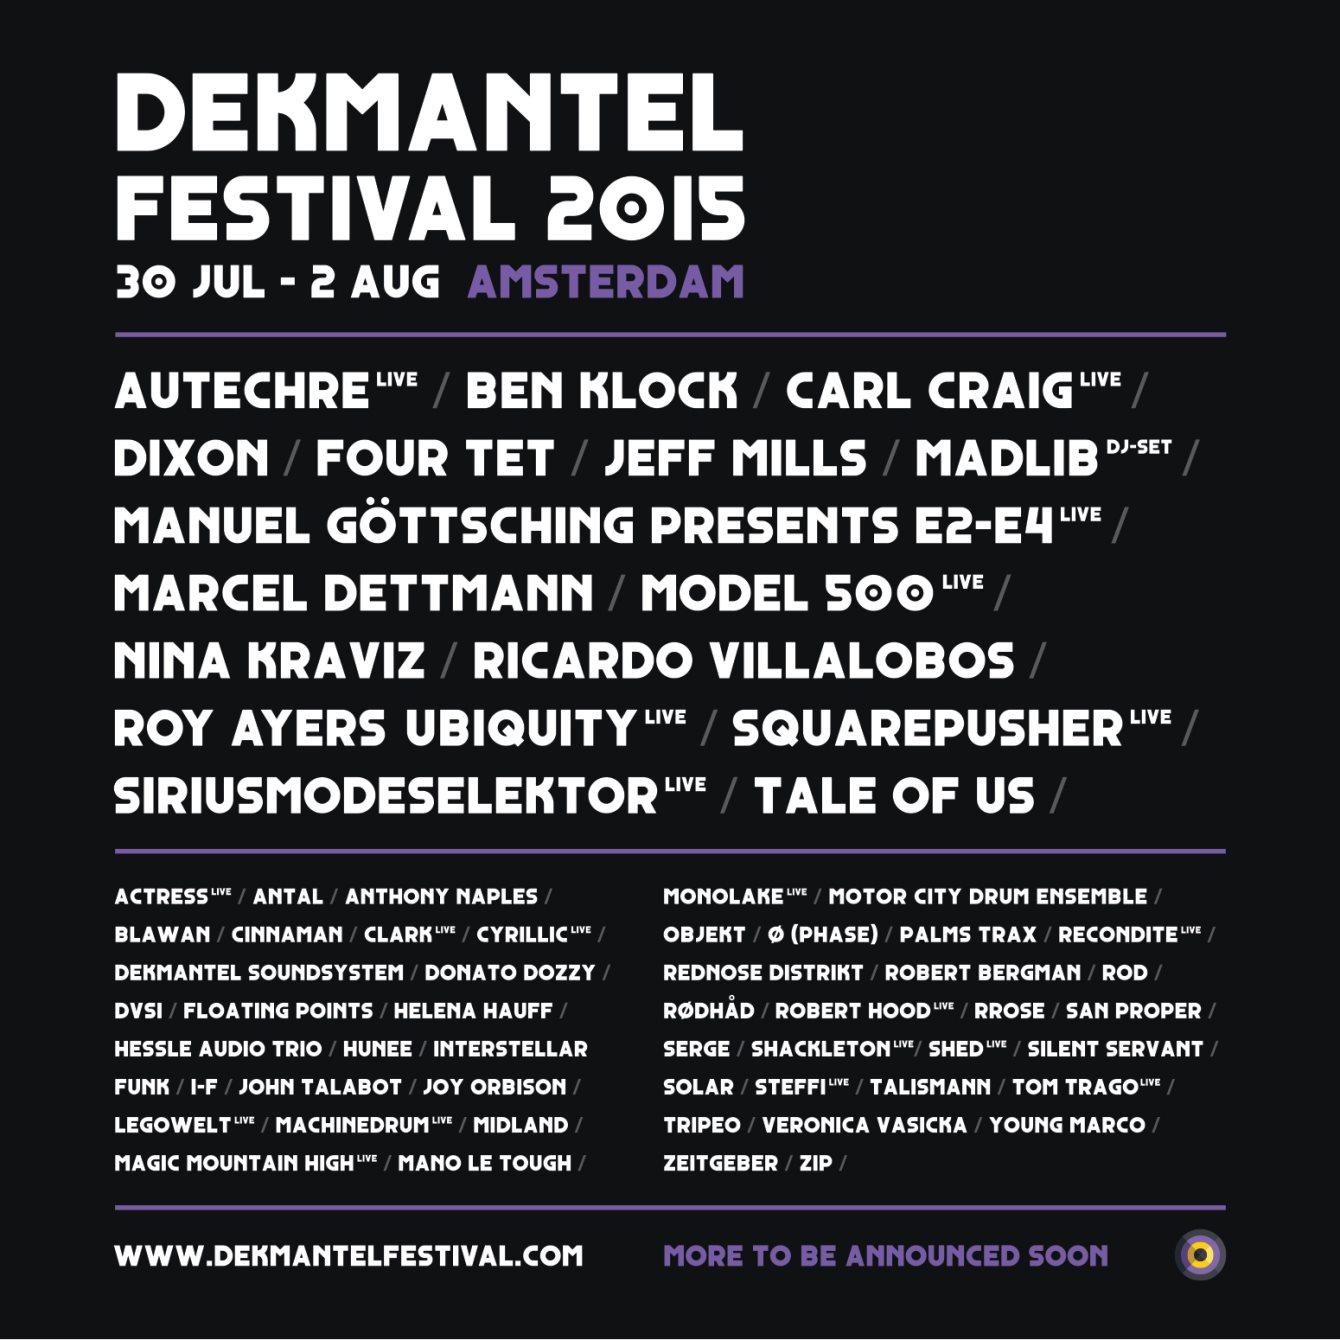 Dekmantel Festival 2015 - Flyer front